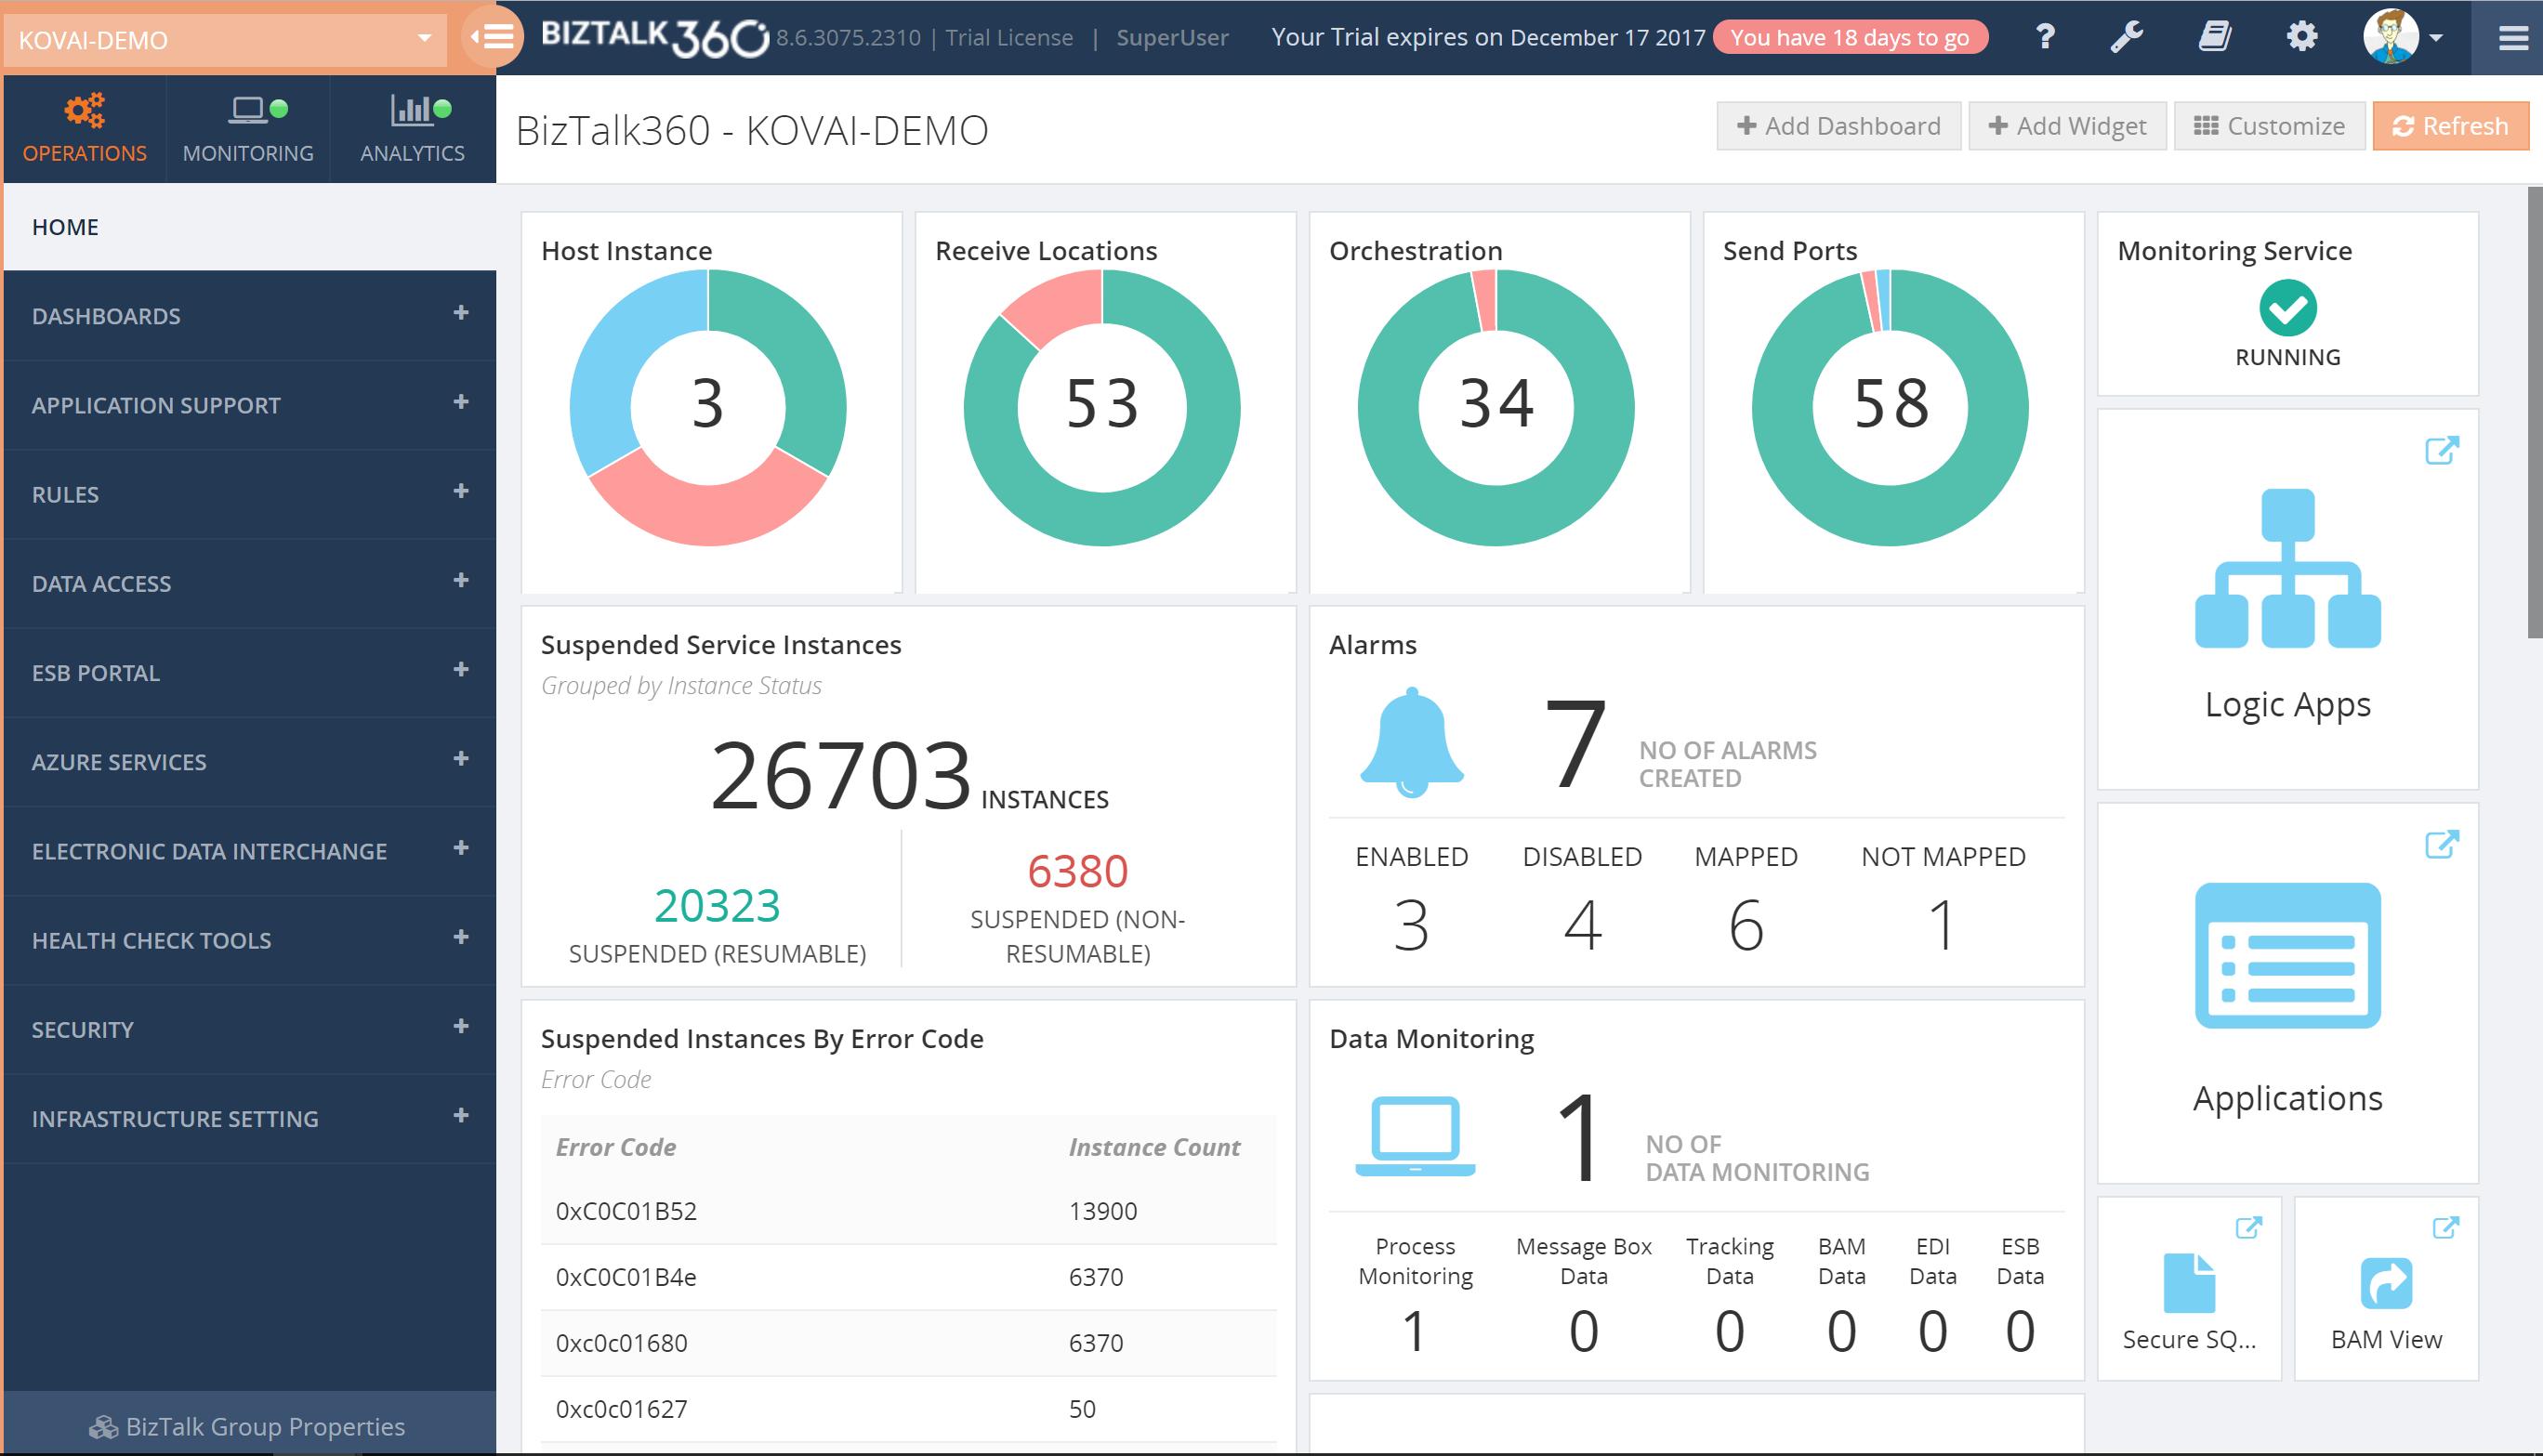 BizTalk360 Operations Dashboard